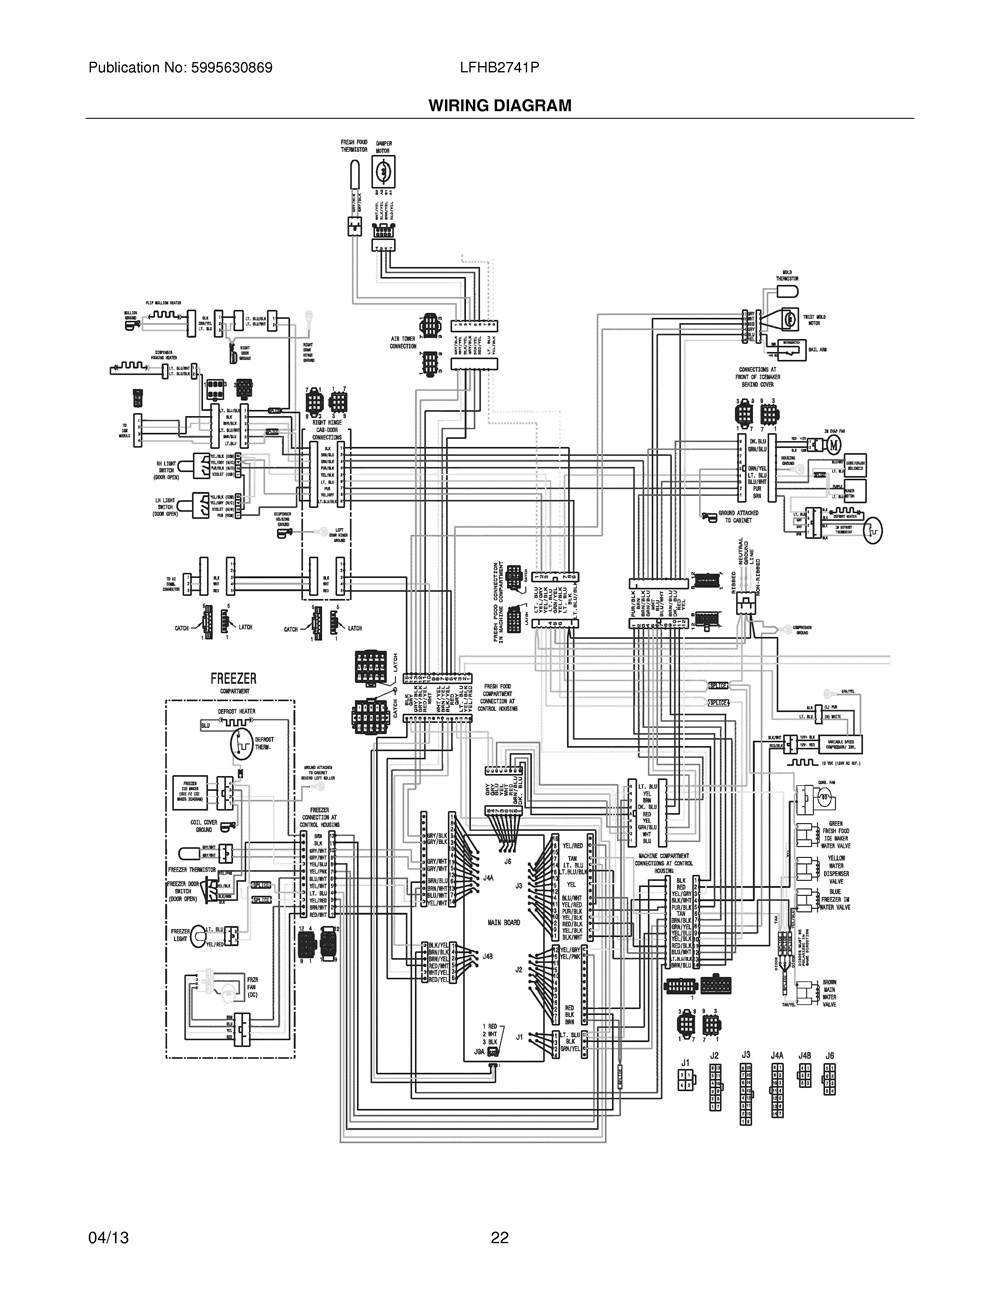 RX_9433] Starcraft Boat Wiring Diagrams Schematics Free DiagramMopar Opogo Osoph Xtern Bemua Mohammedshrine Librar Wiring 101